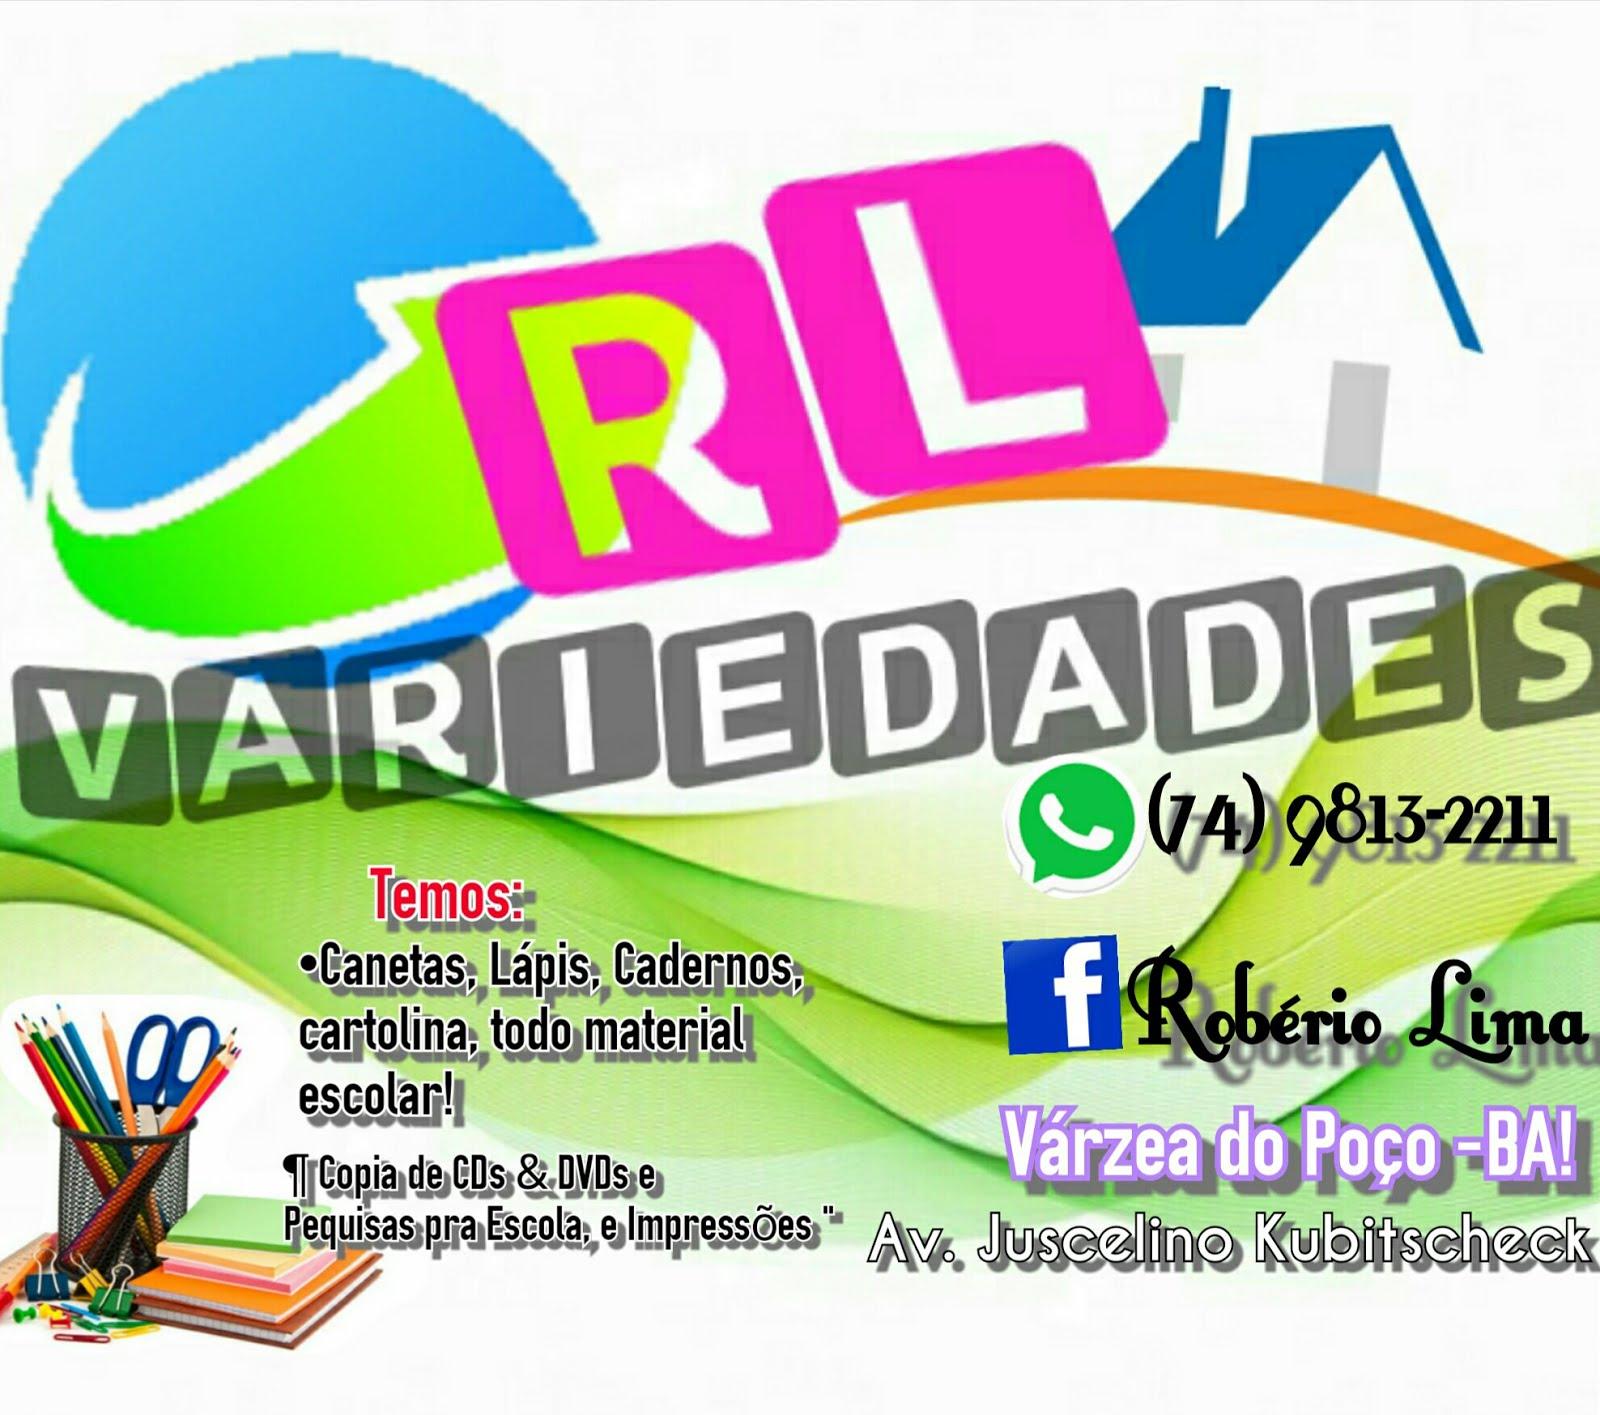 R L Variedades!